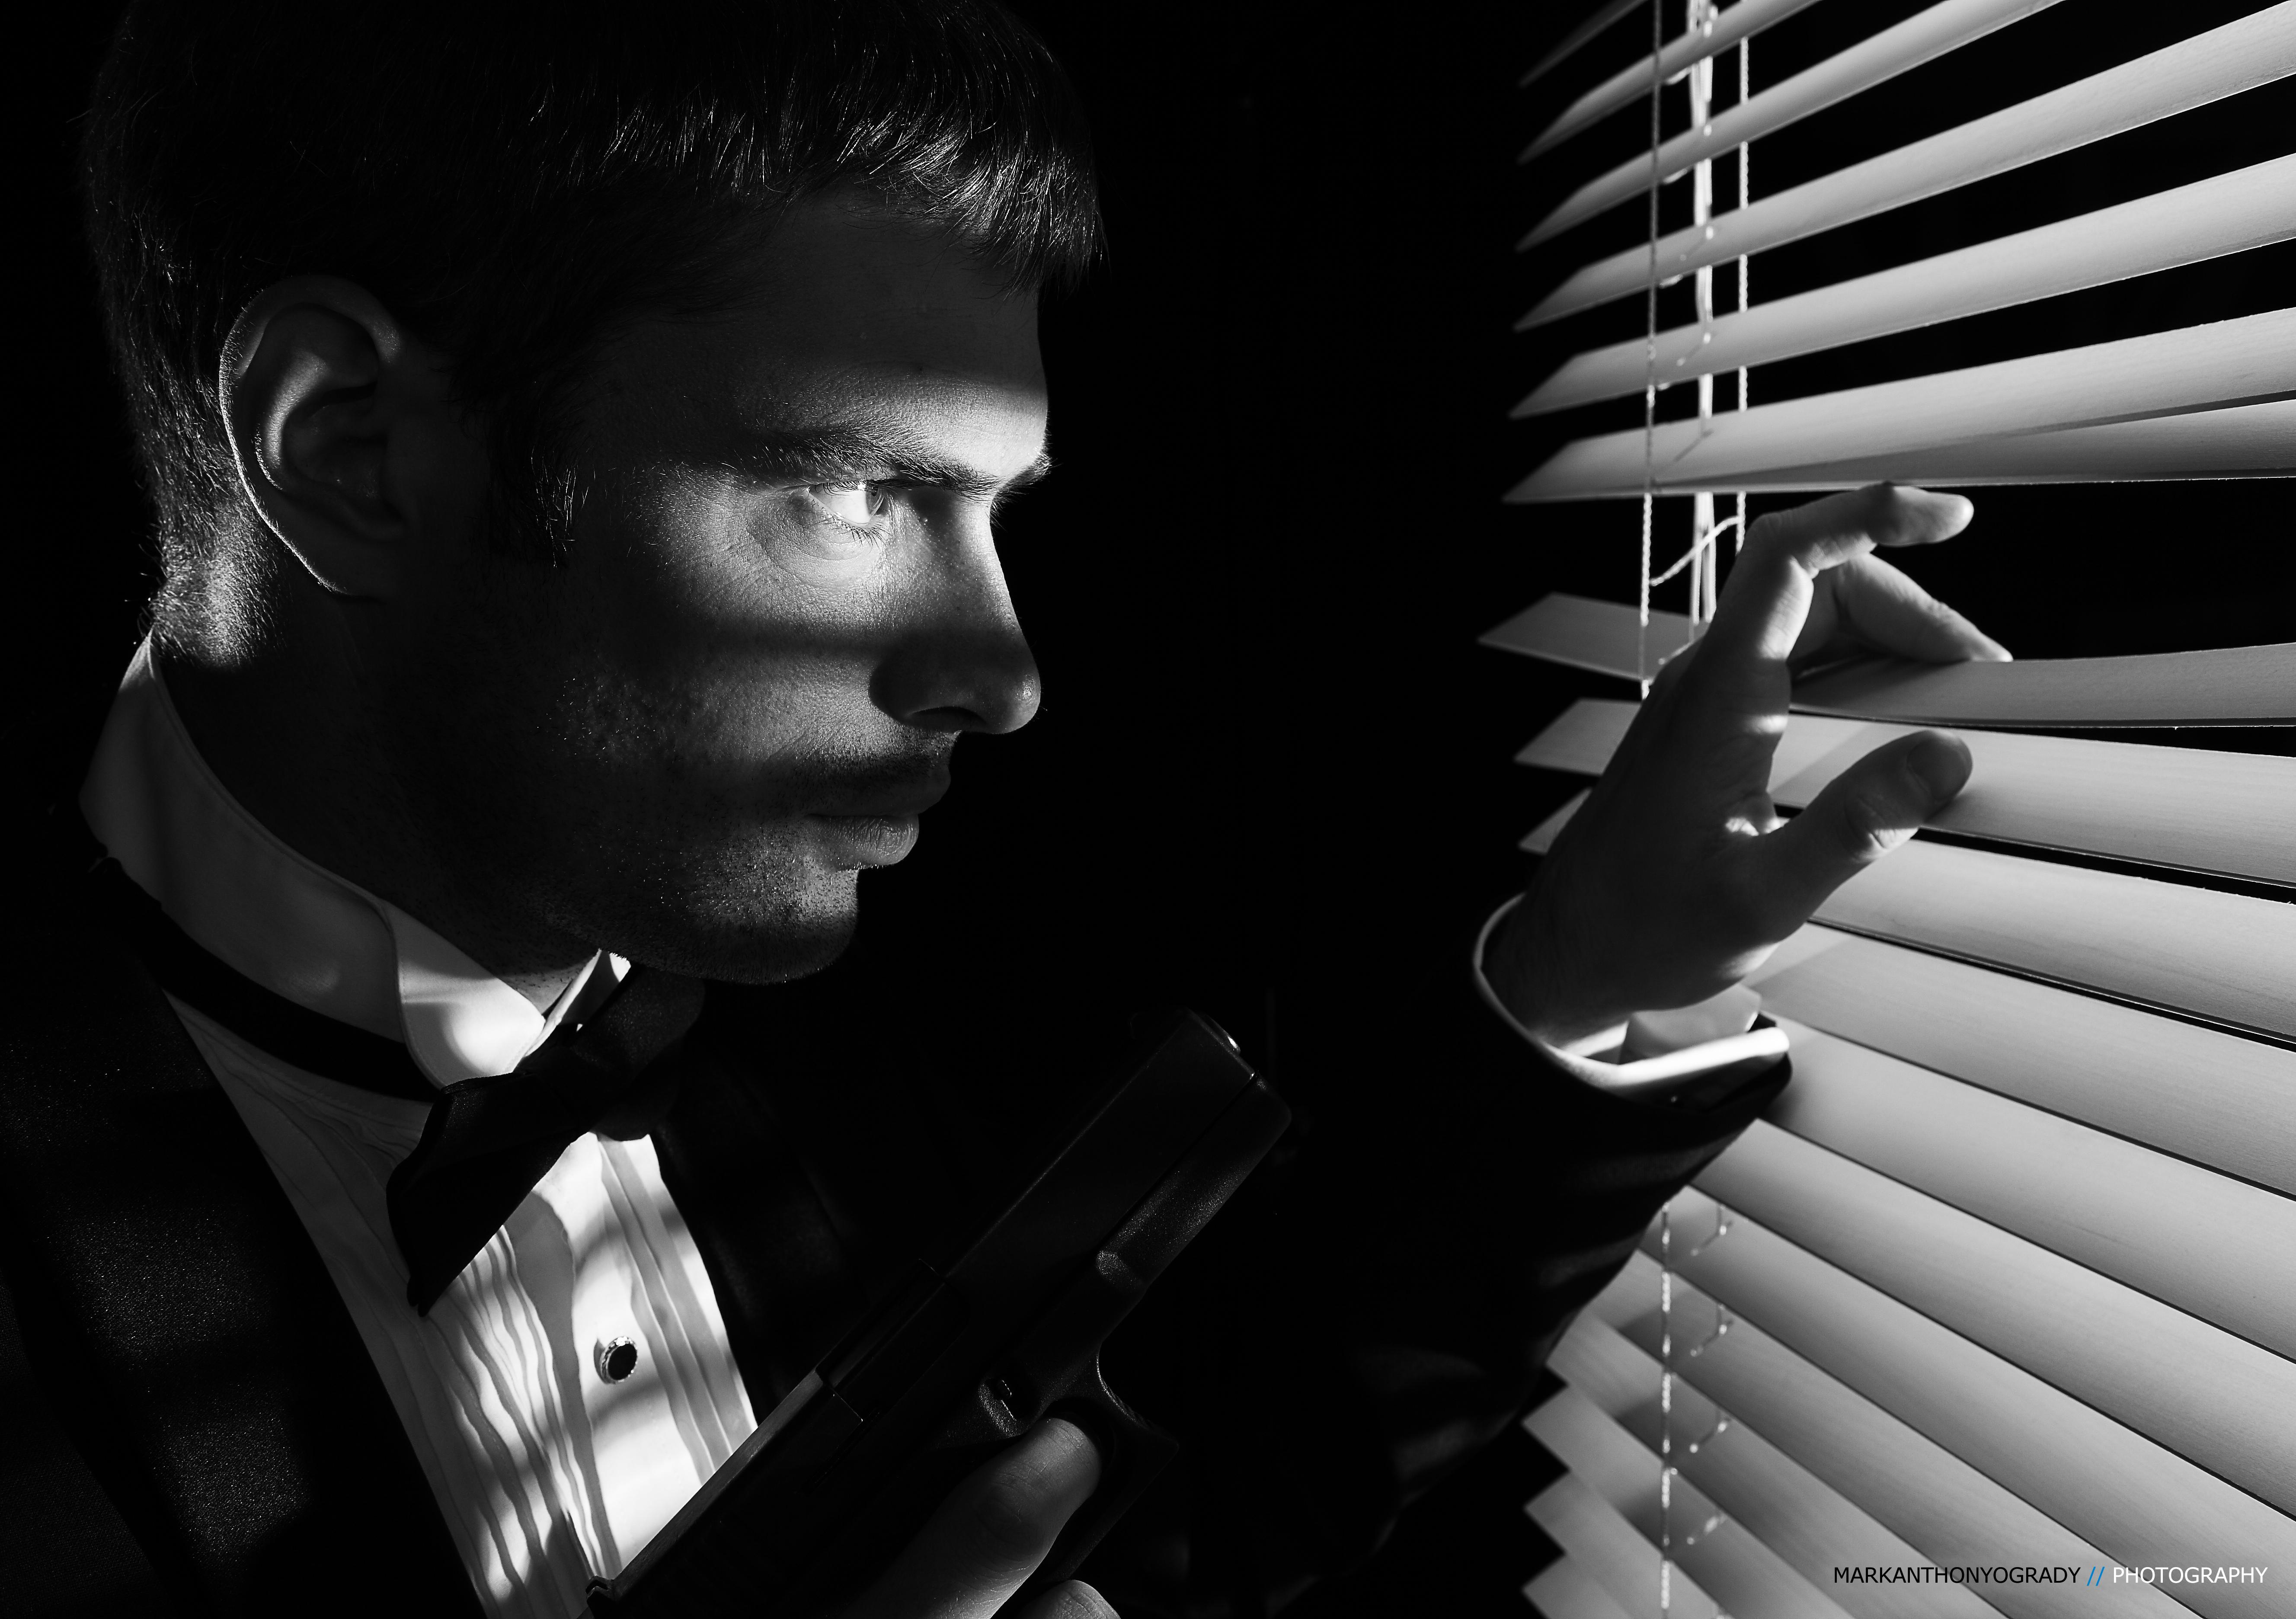 Film noir | #lighting | Photos | Pinterest | Beautiful, Lightning ...